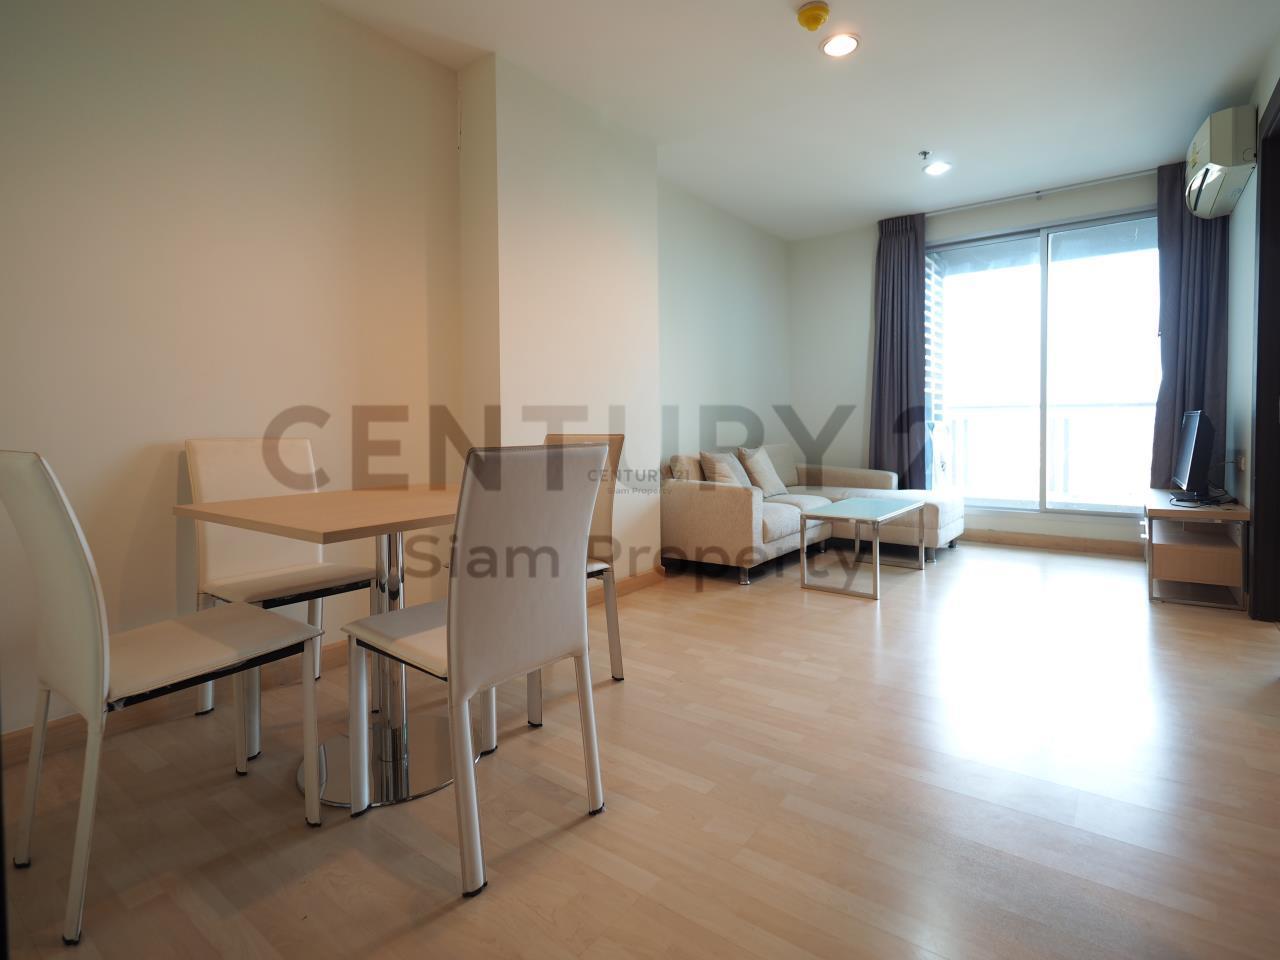 Century21 Siam Property Agency's Rhythm Ratchada 3